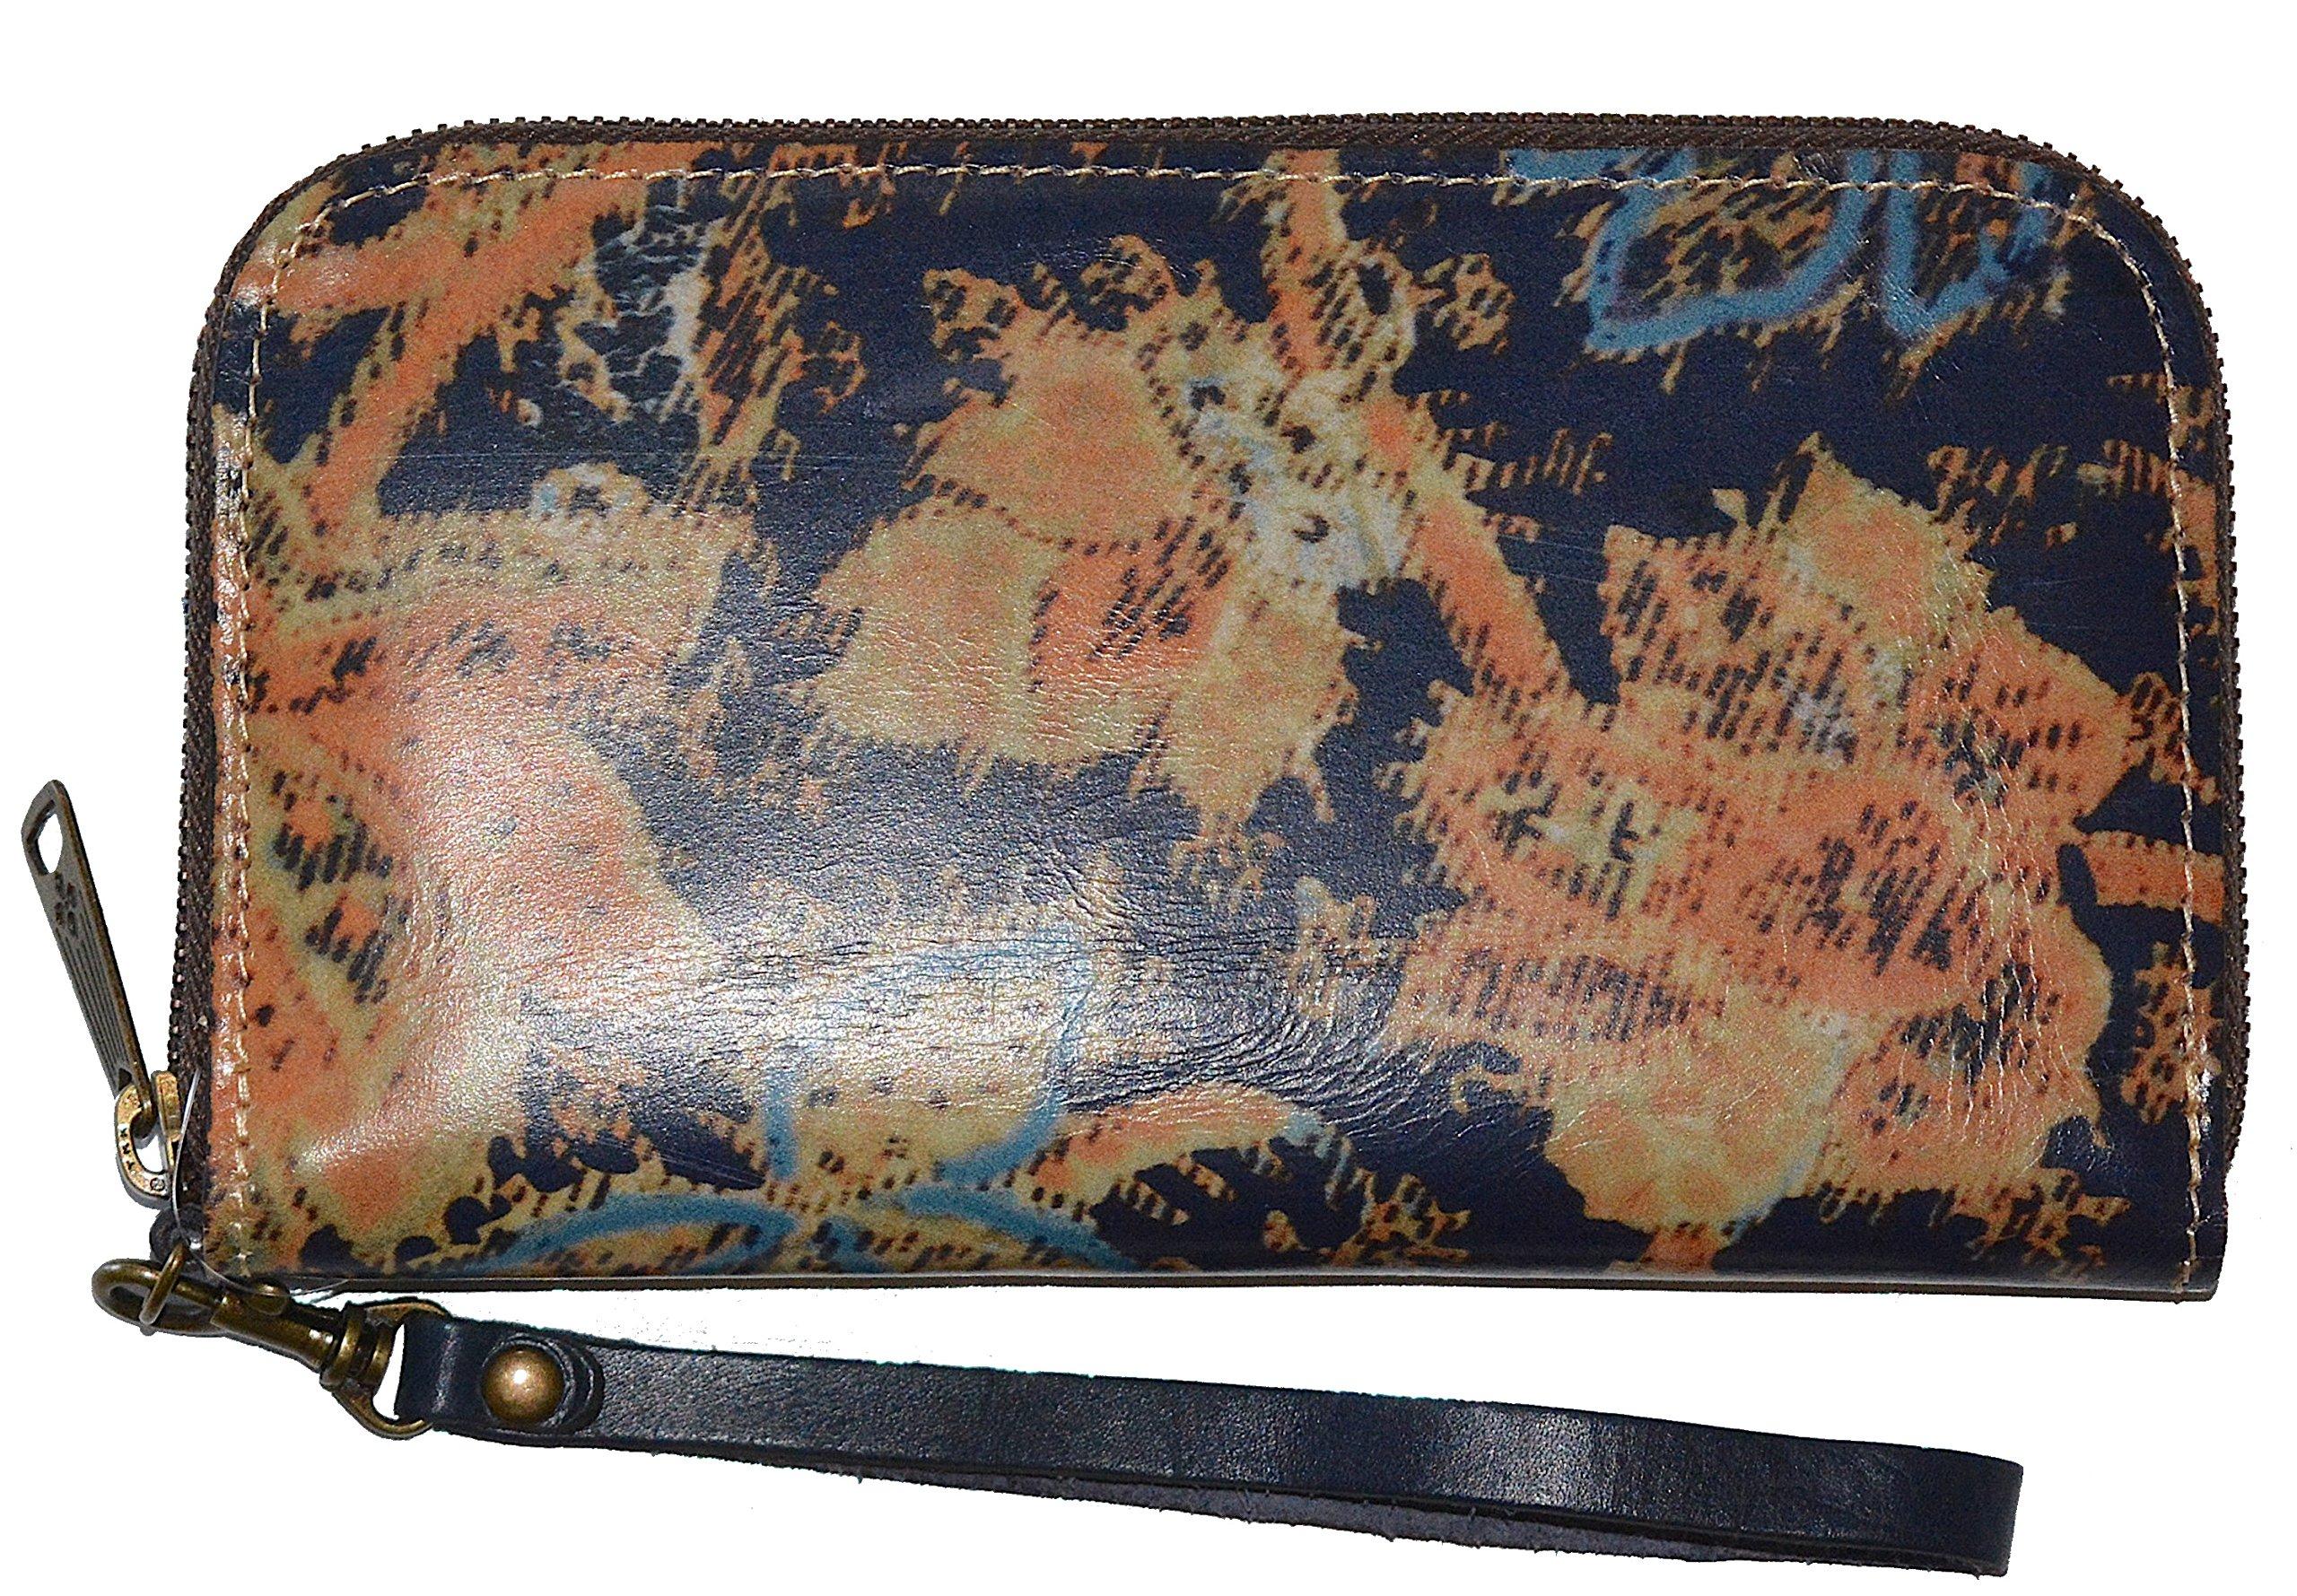 Patricia Nash Italian Leather Women's Biscay Wristlet Clutch Wallet Purse Bag